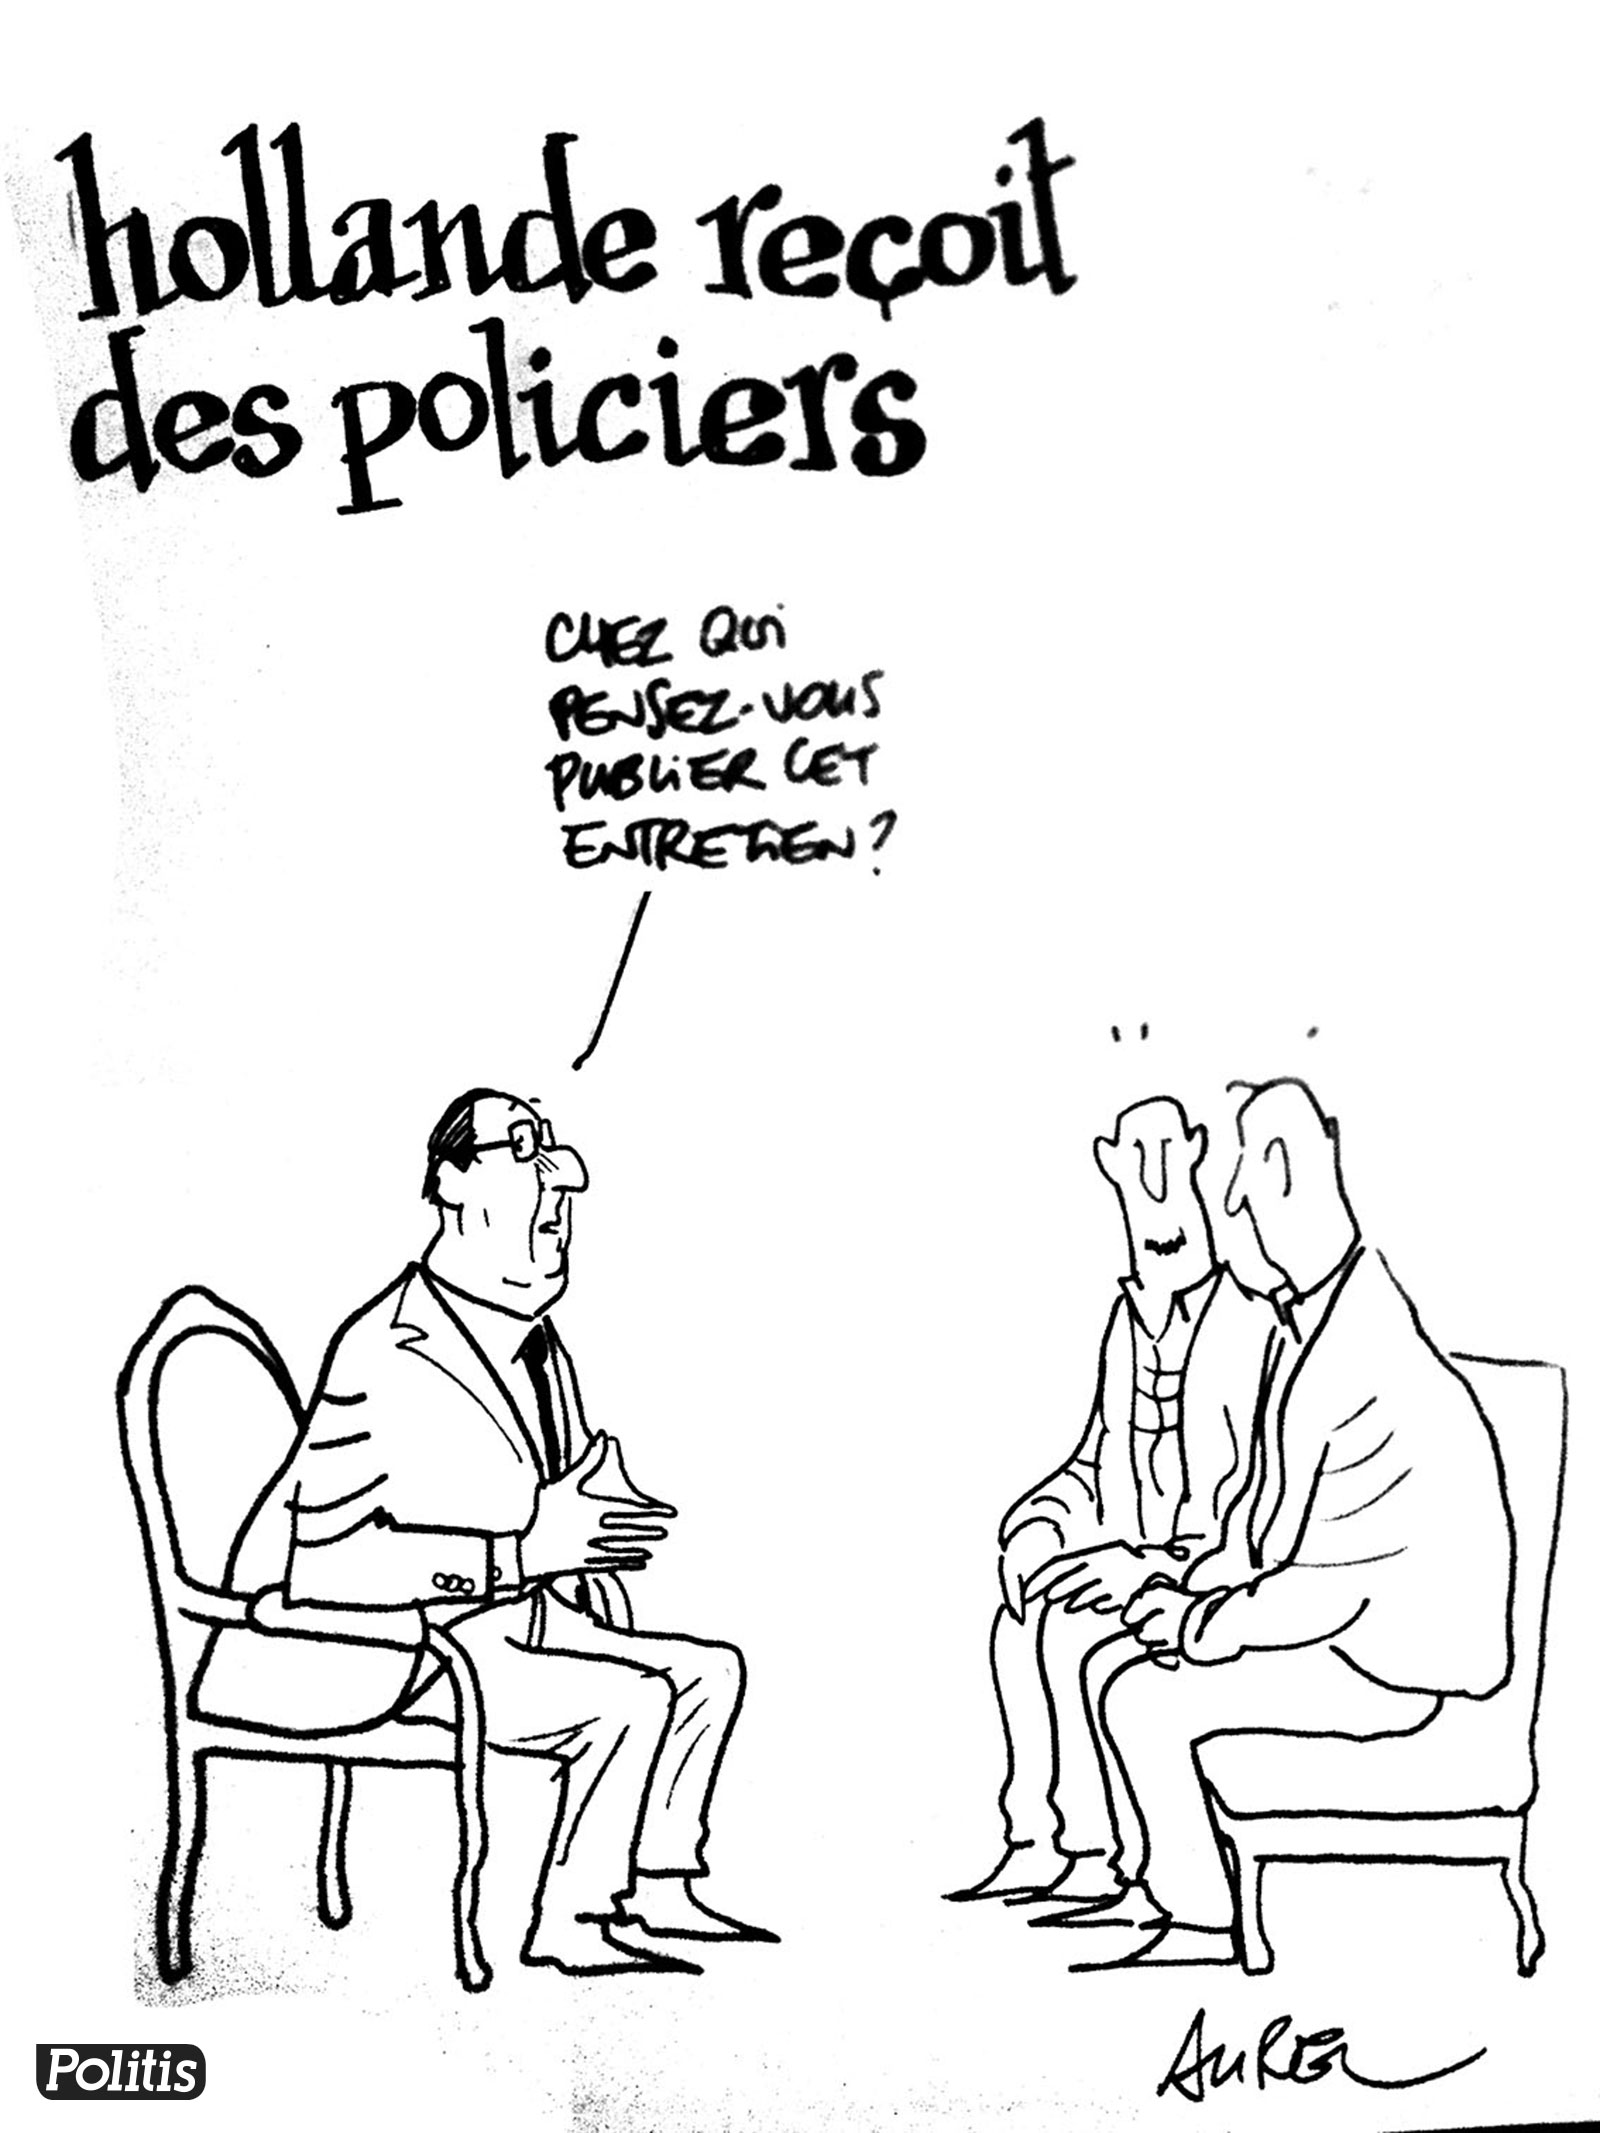 © Politis